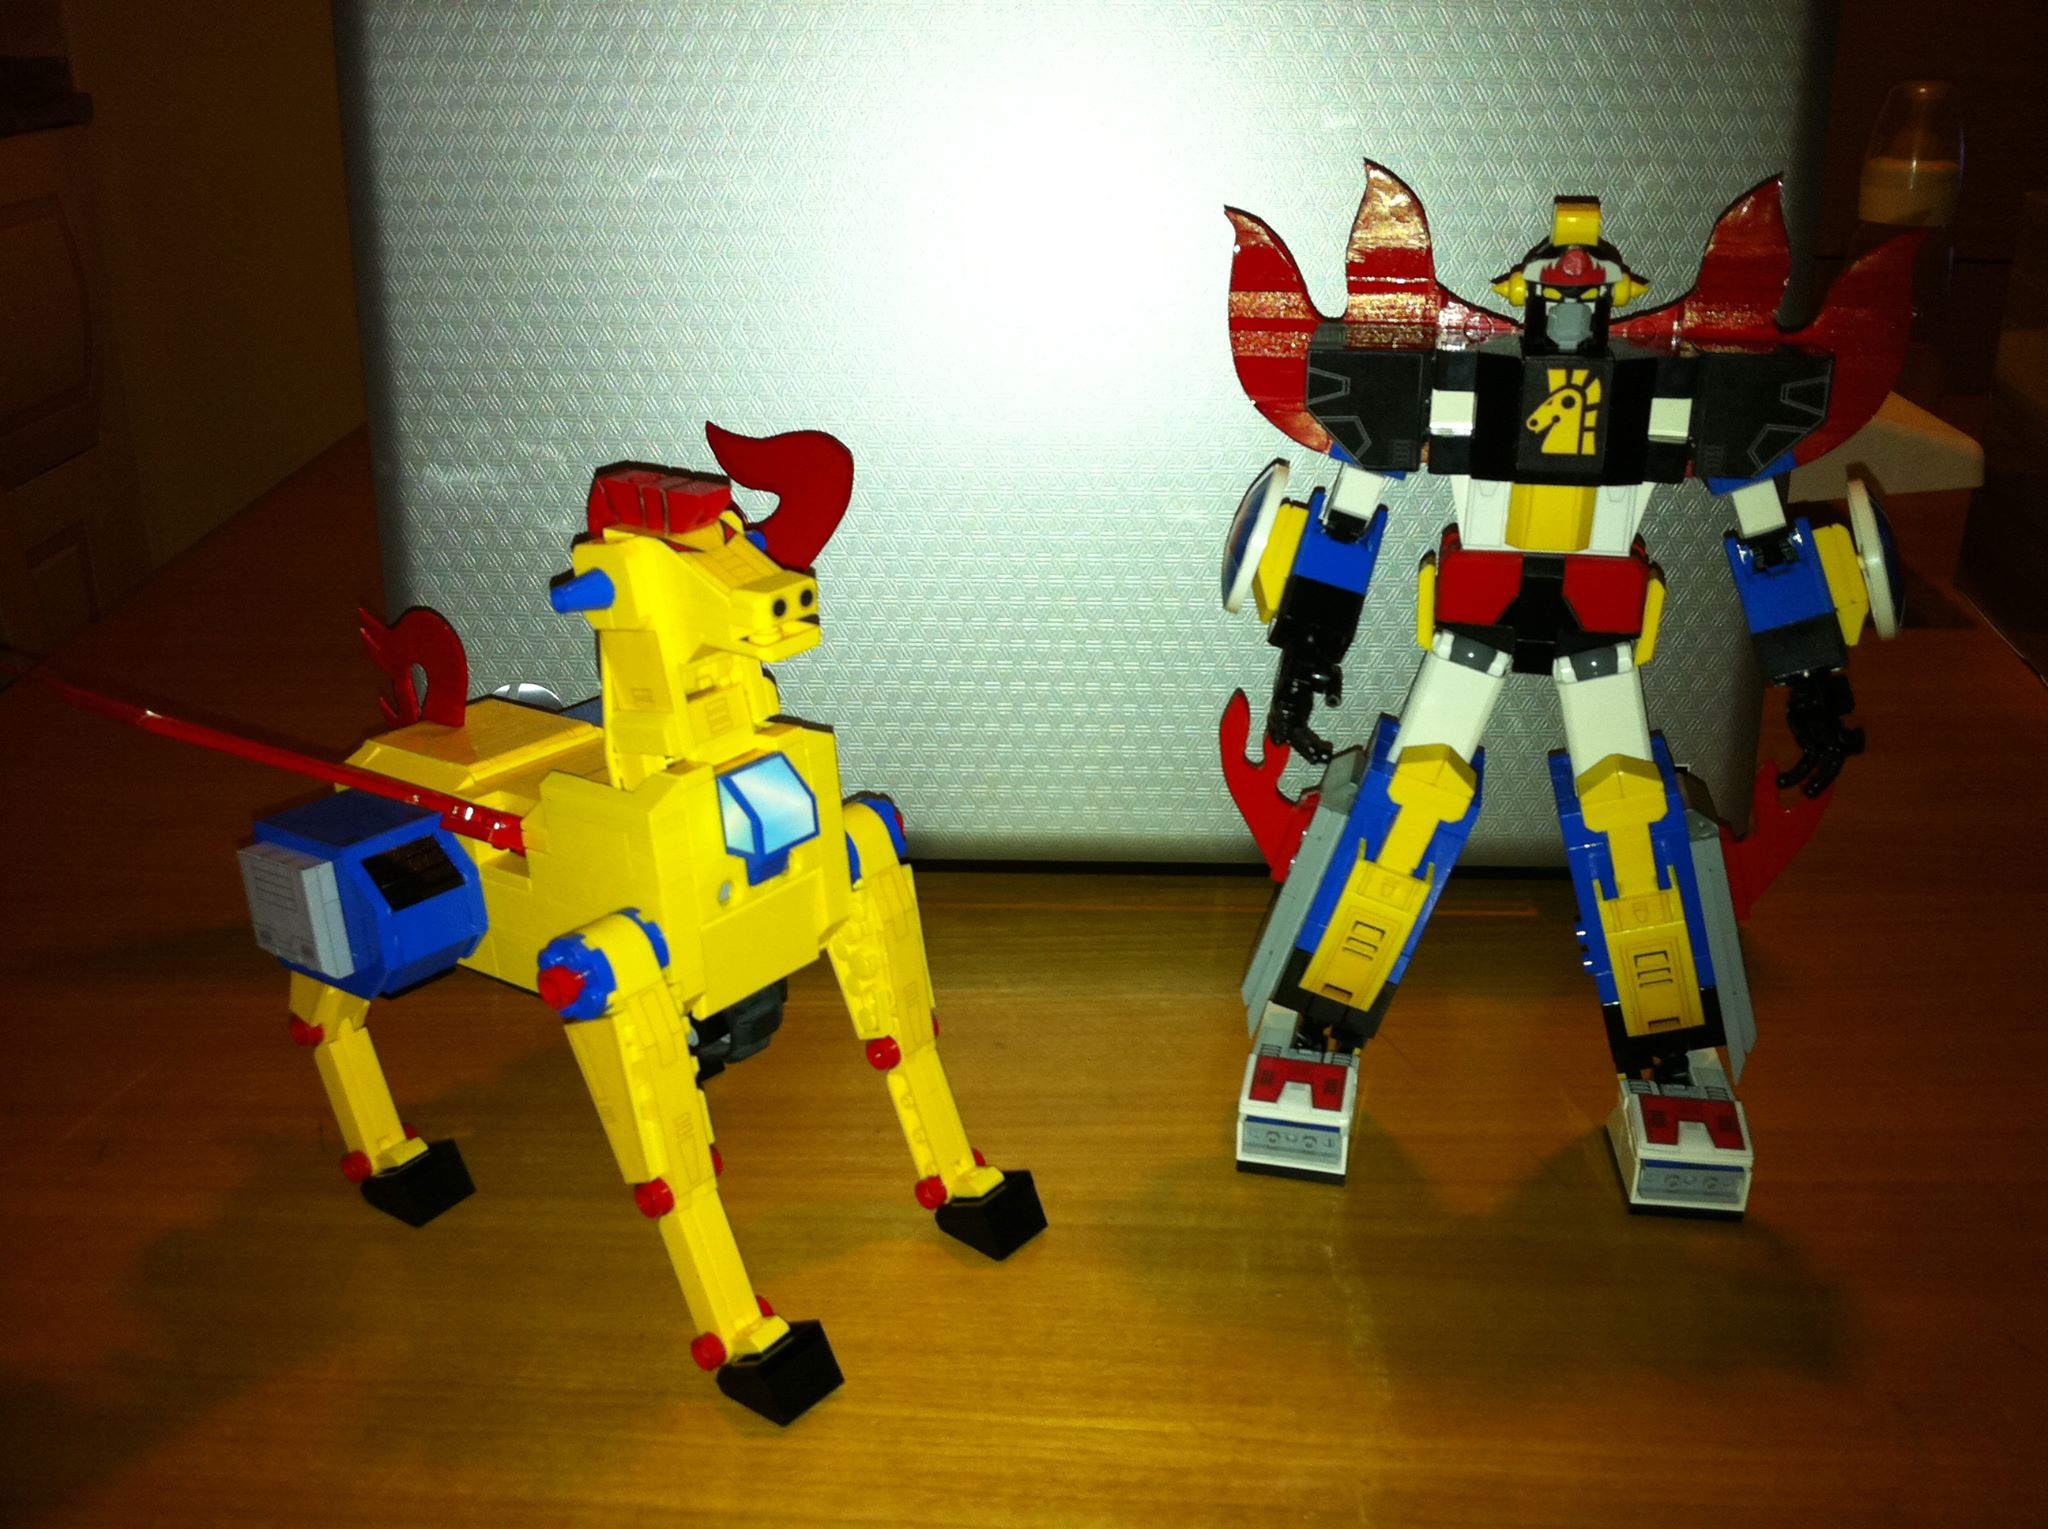 Lego Kingstar 01